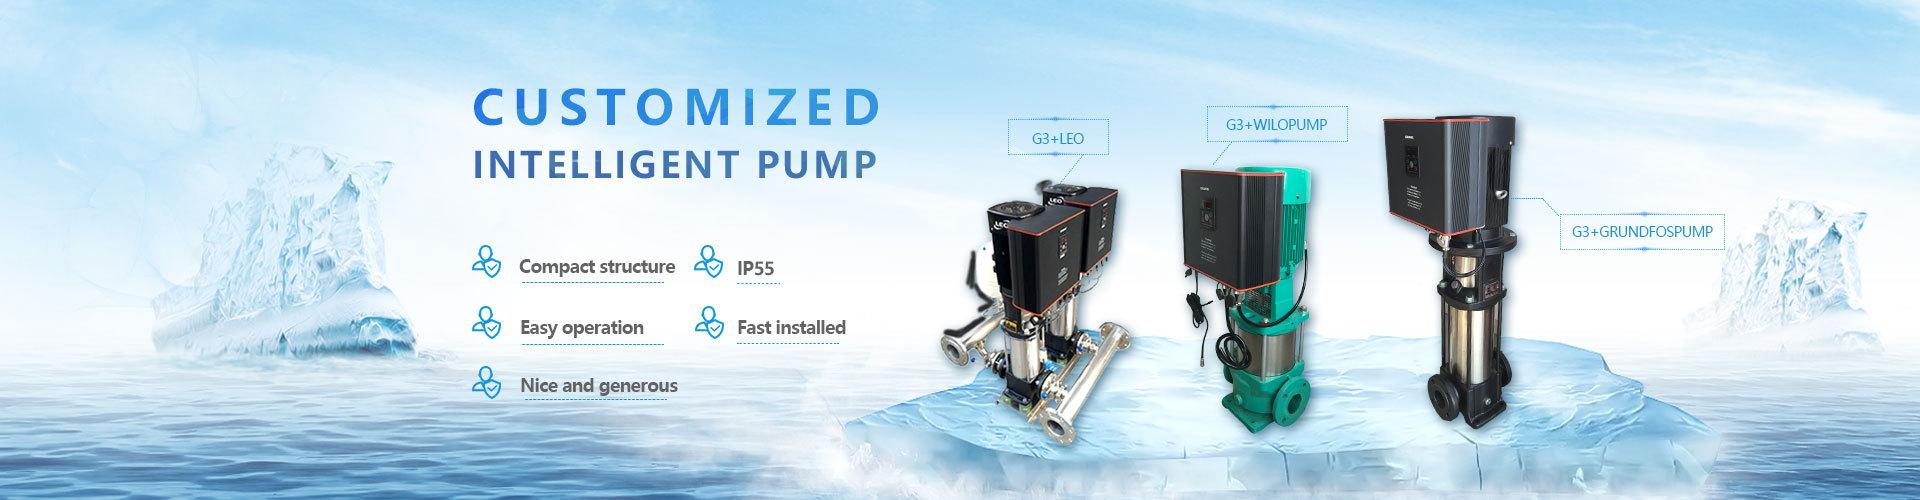 GRE / GRNE智能水泵